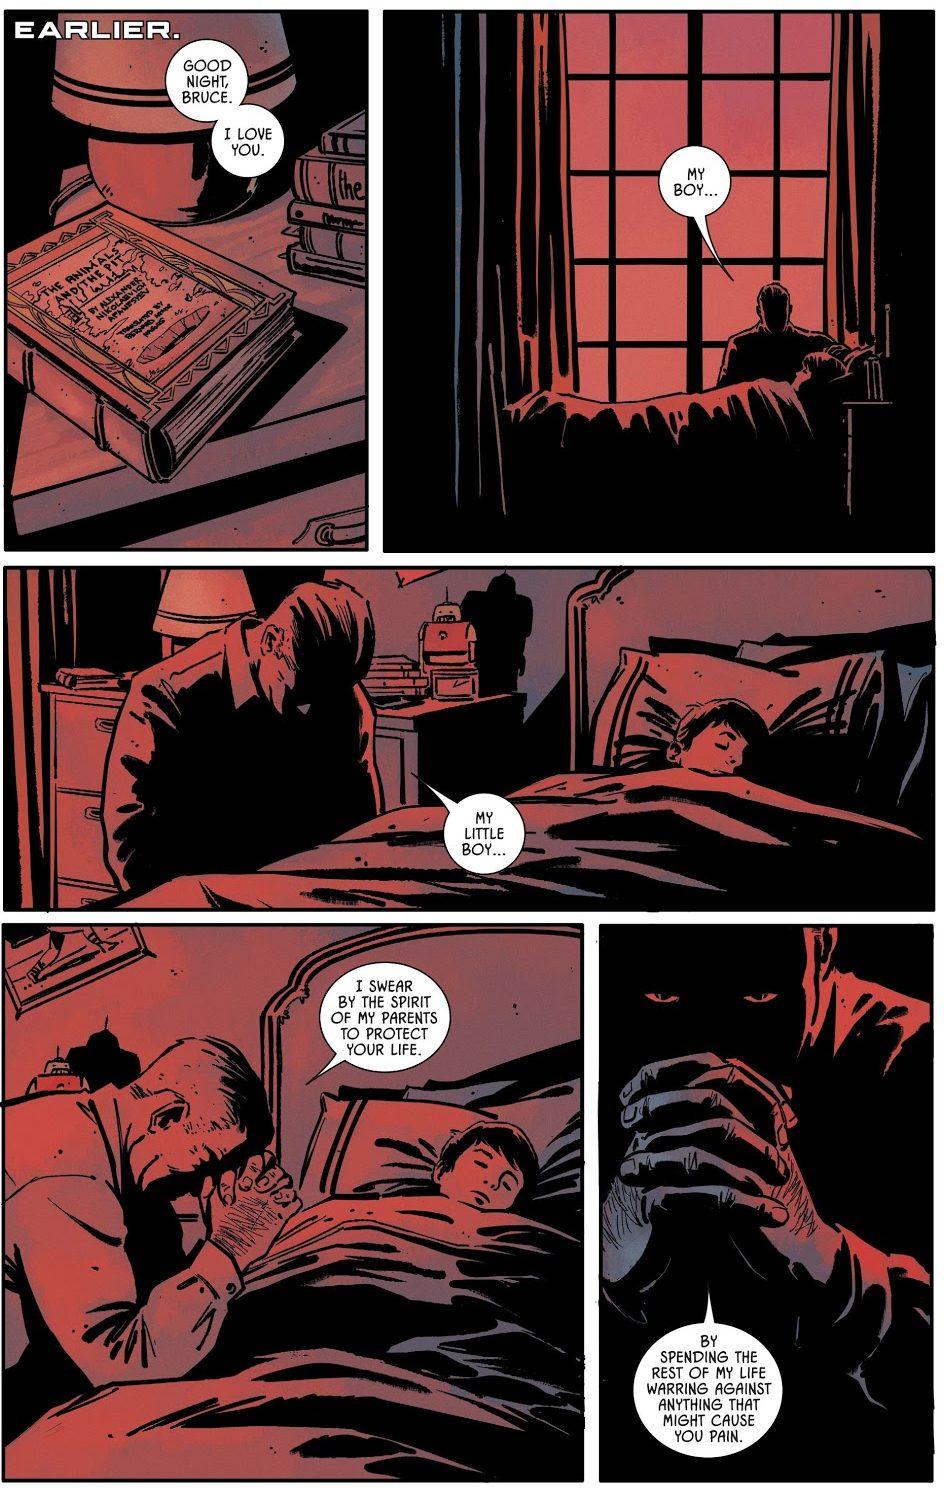 Thomas Wayne Kills Joe Chill